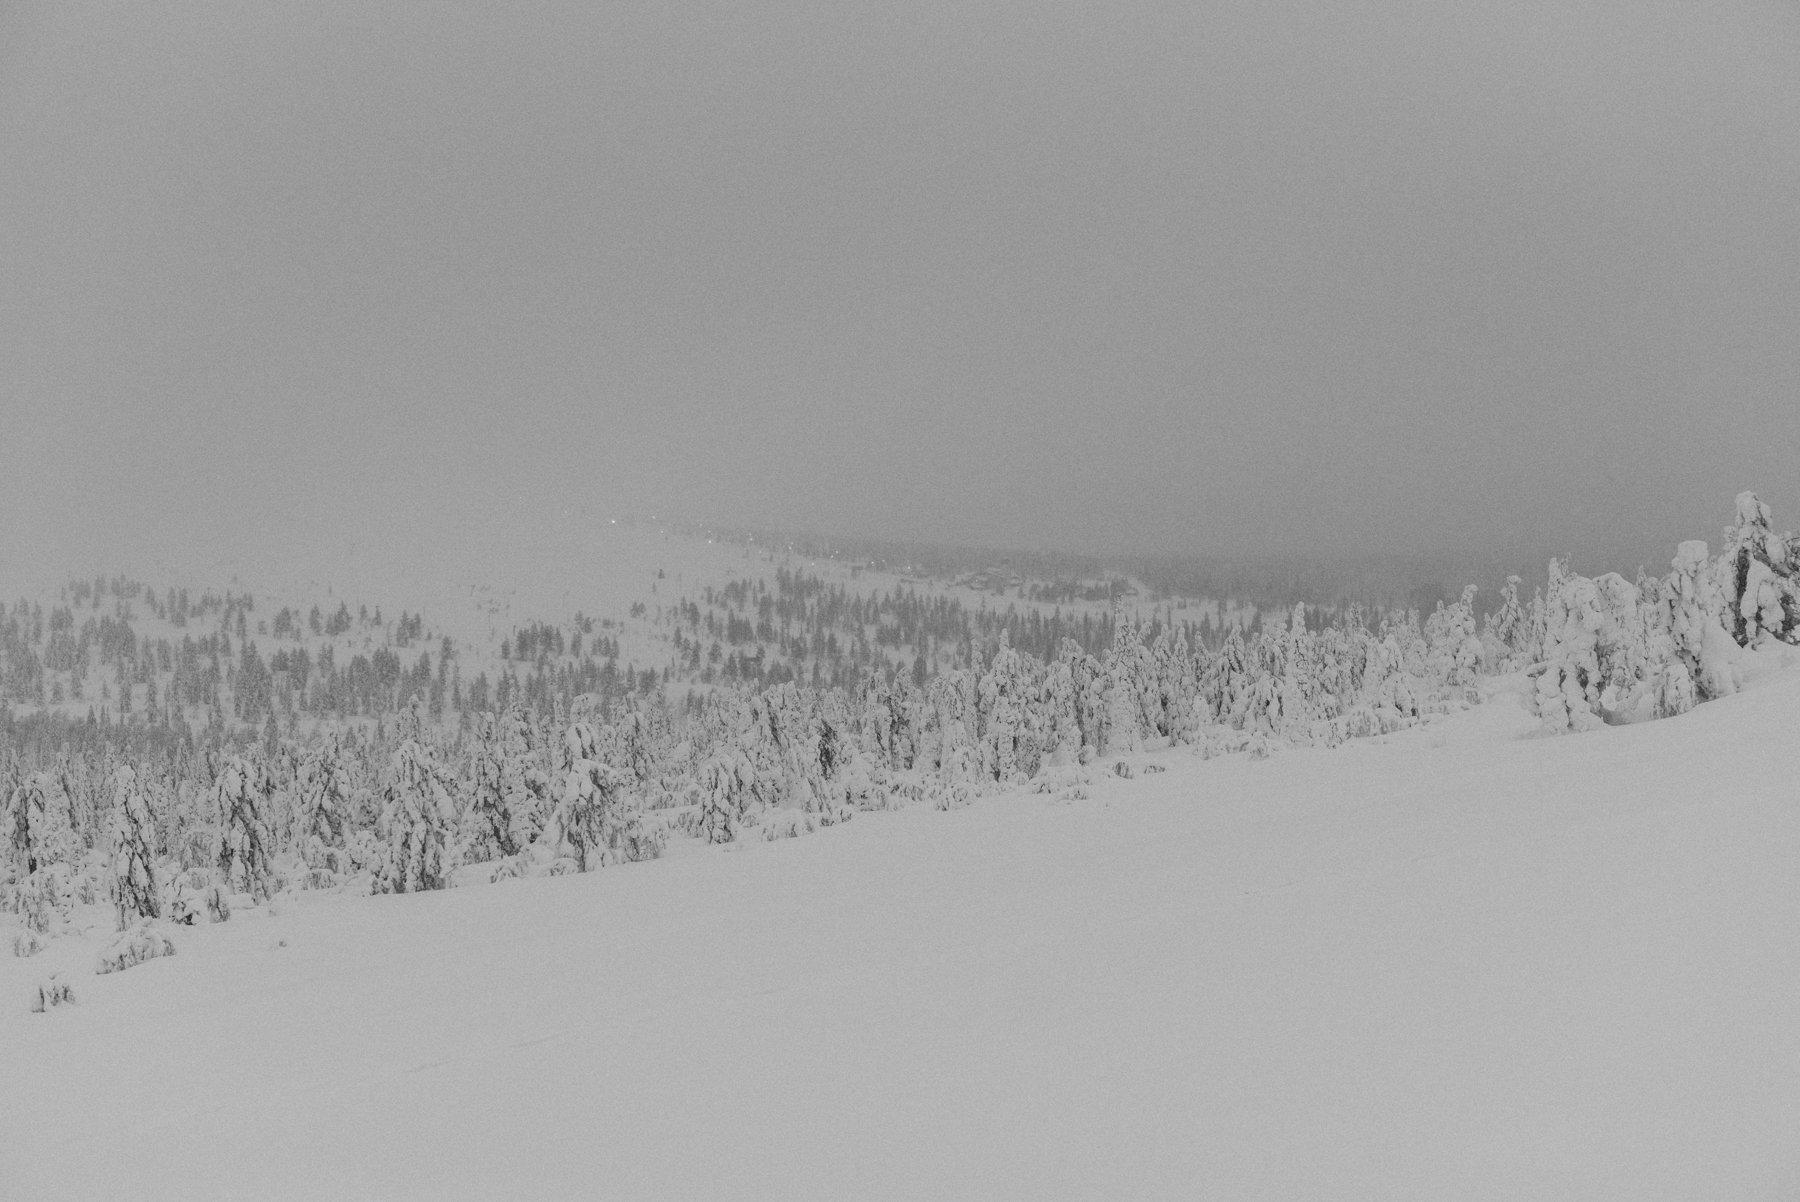 reisefotografie-lappland-finnland-138